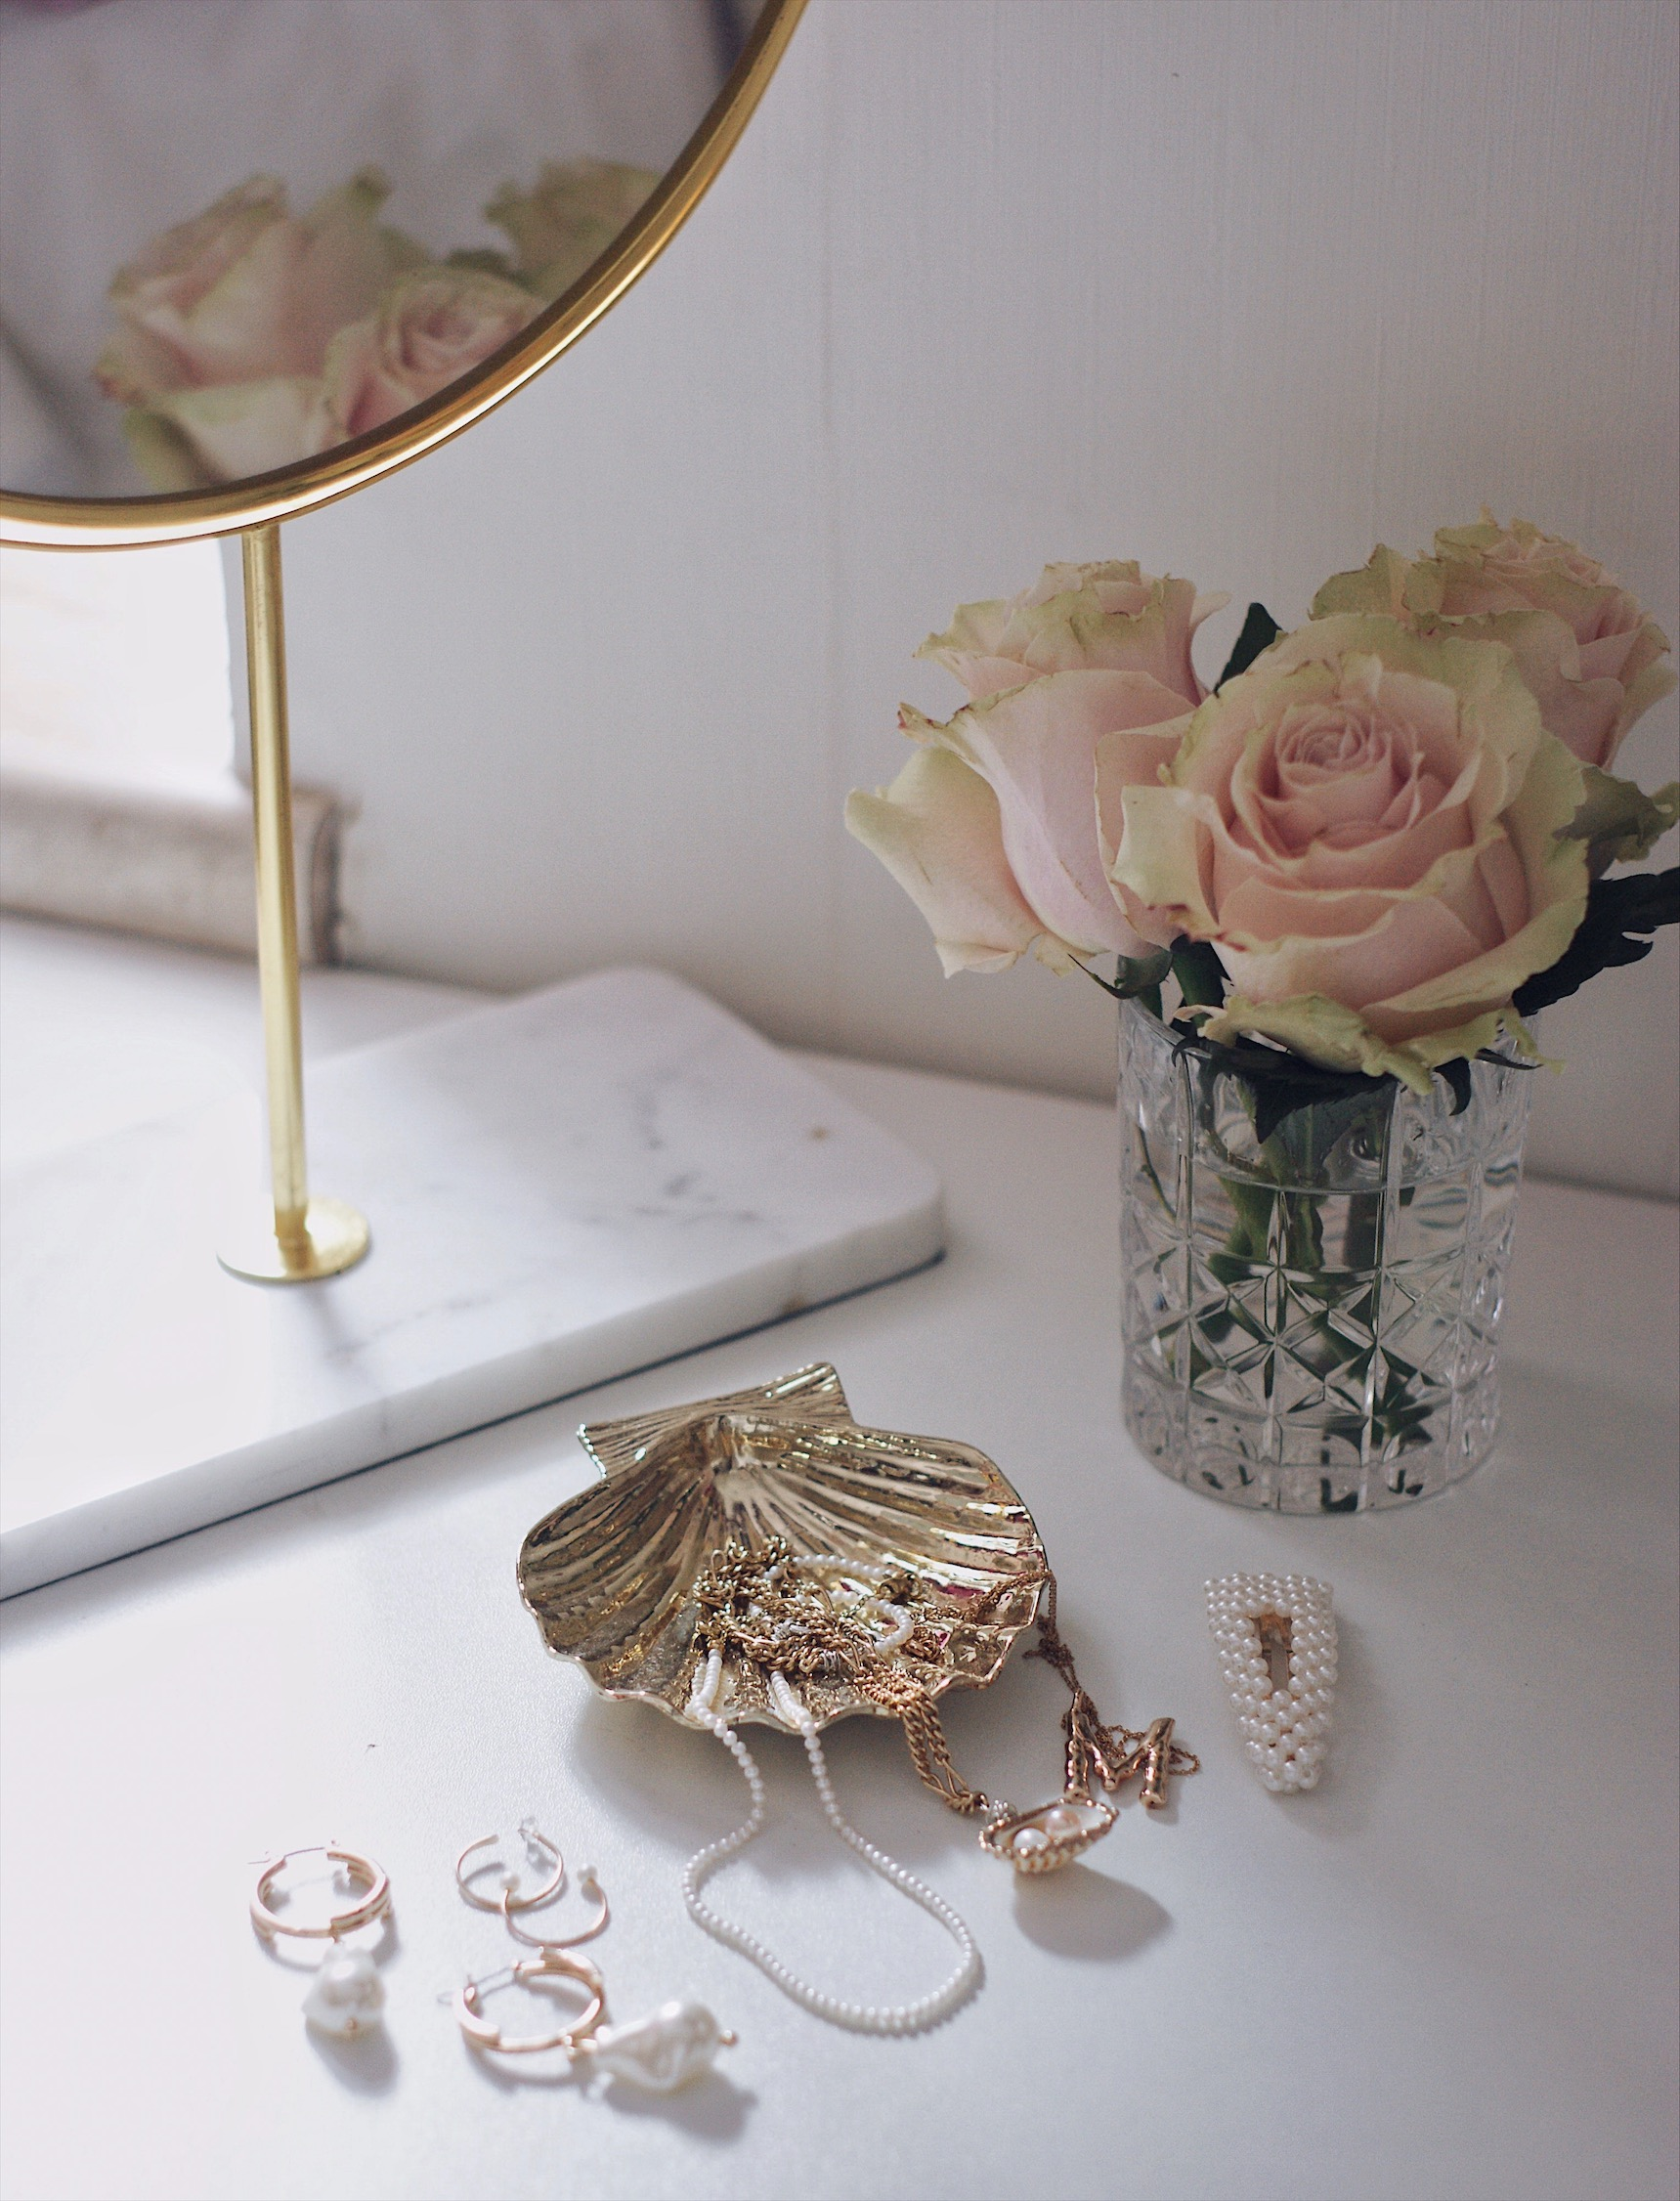 Kleine Vasen rosa Rosen